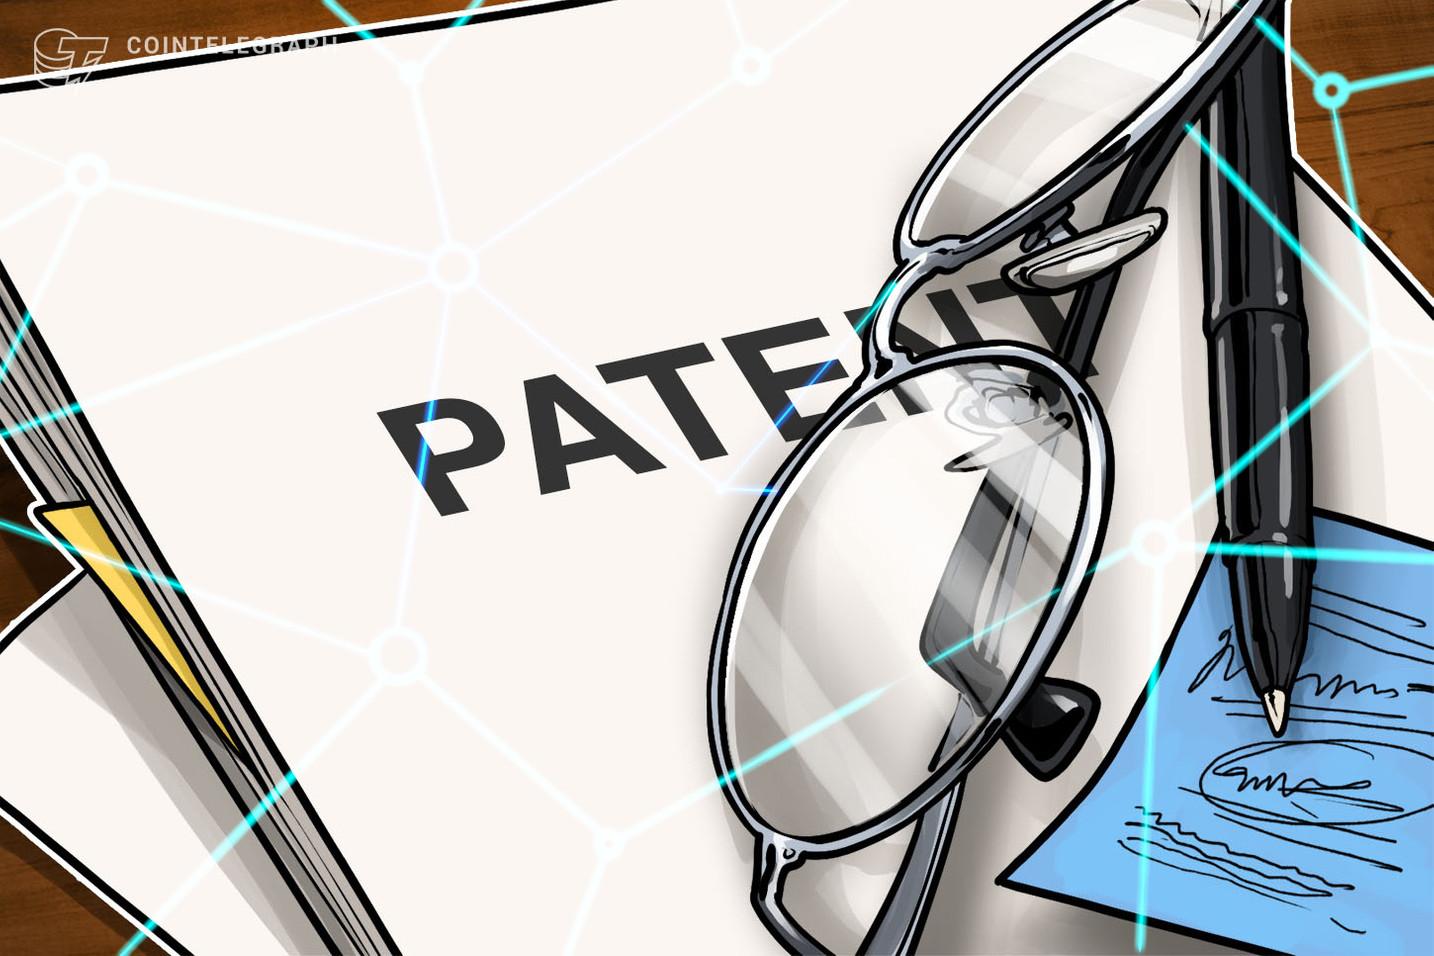 IBM Targets Scientific Research in Latest Blockchain Patent